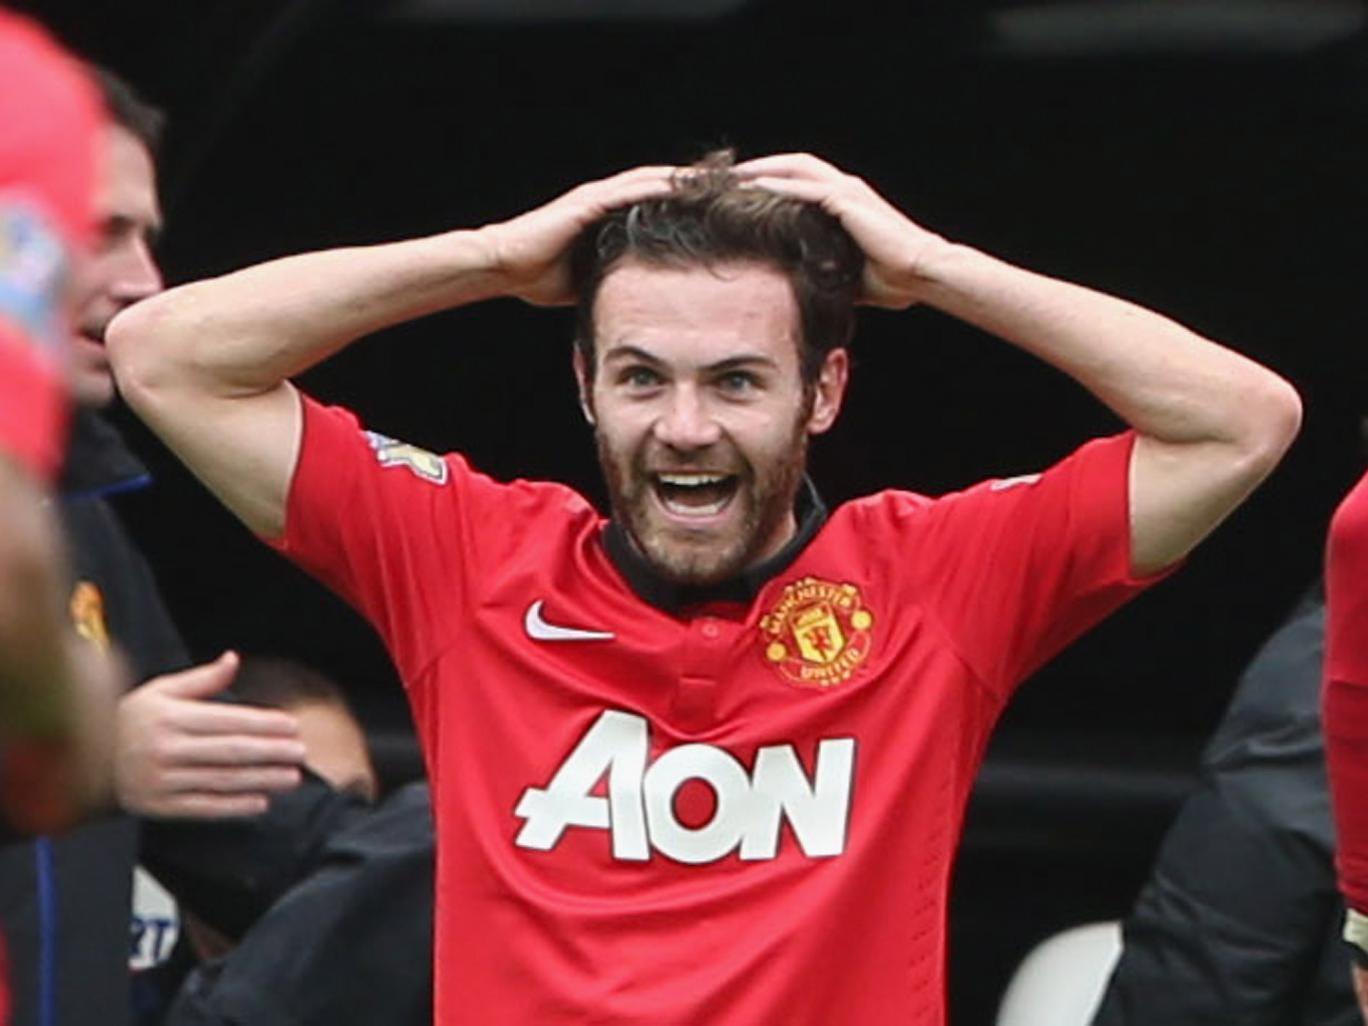 Juan Mata celebrates scoring for Manchester United in the 4-0 win over Newcastle